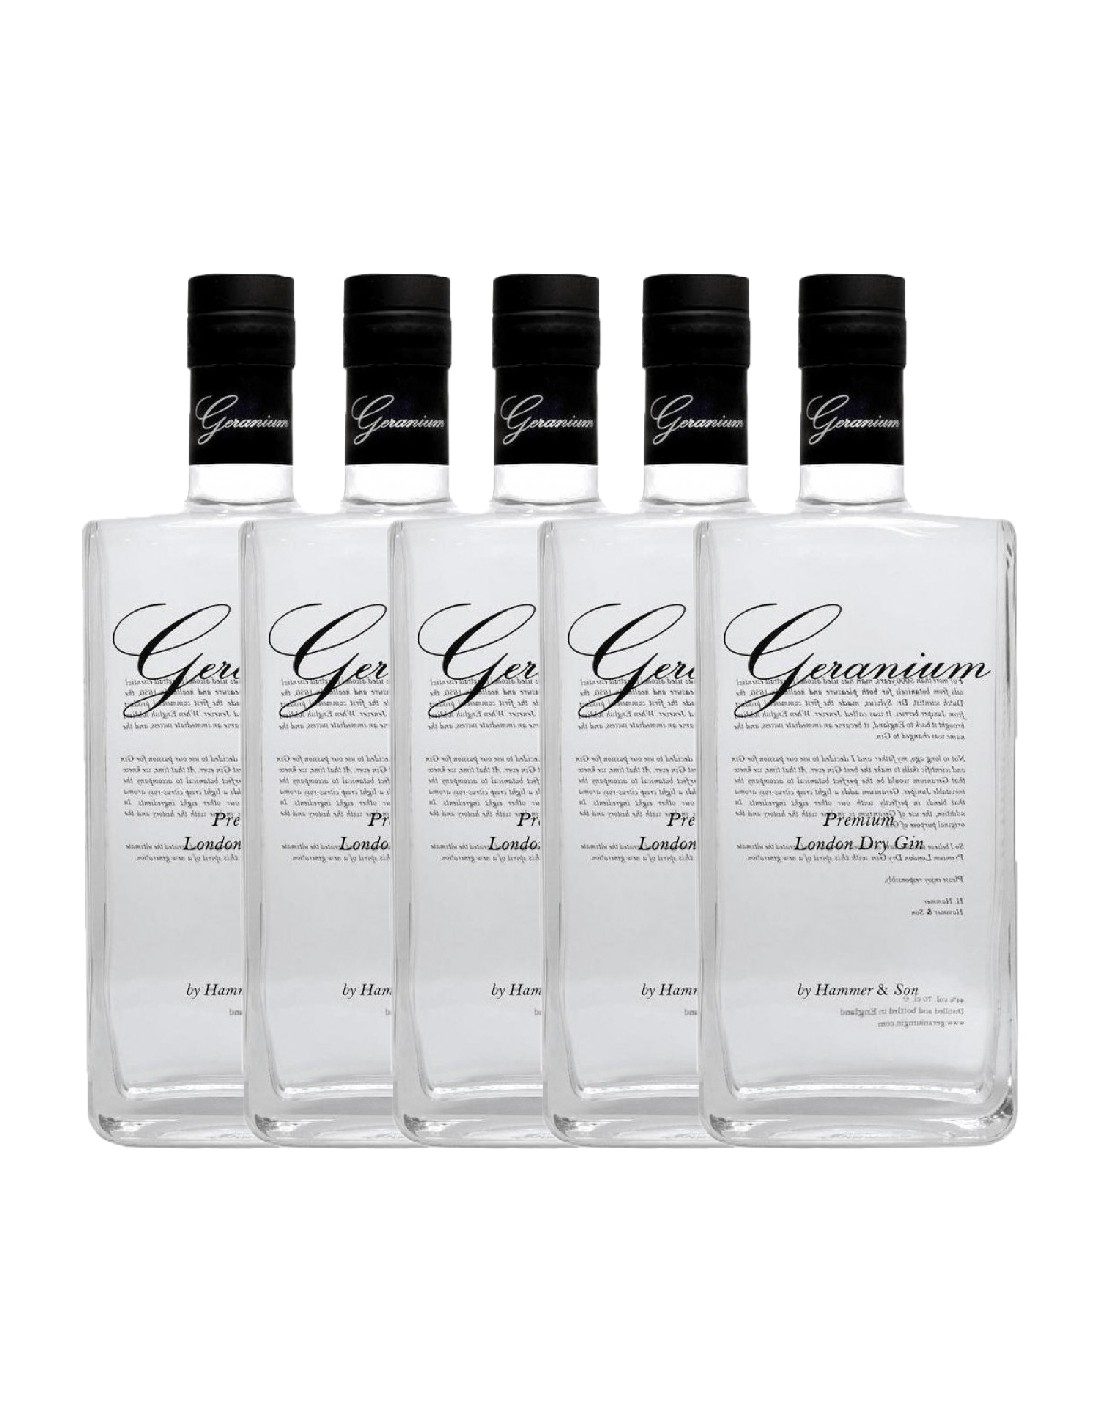 Pachet 5 sticle Gin Geranium 44% alc., 0.7L, Marea Britanie